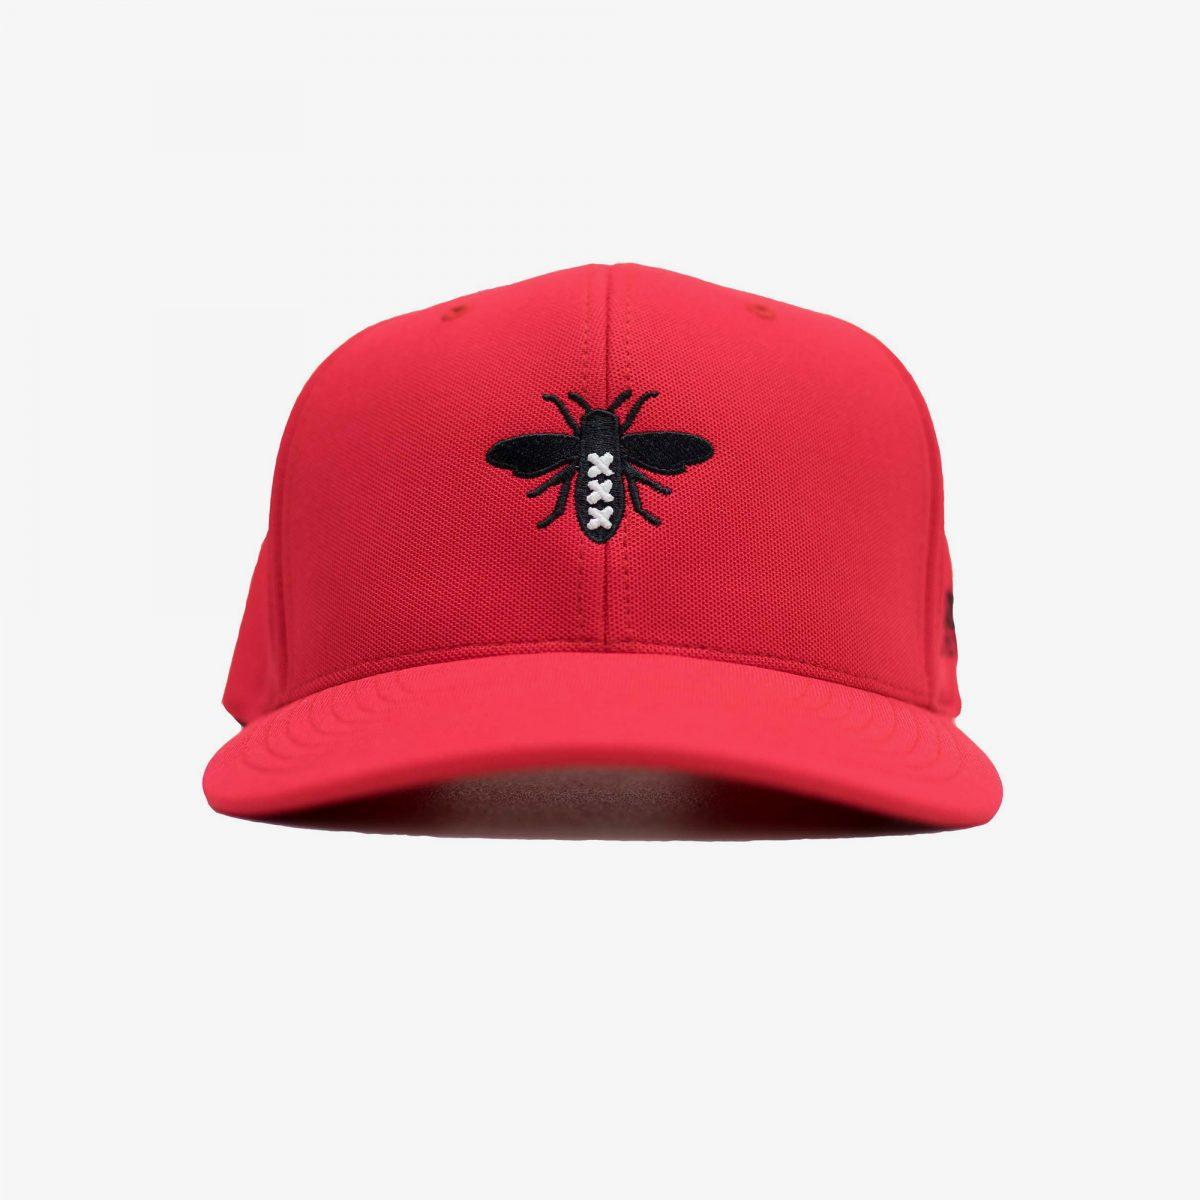 AFCA-Red-Limited-Flexfit-Front-Grey-Background